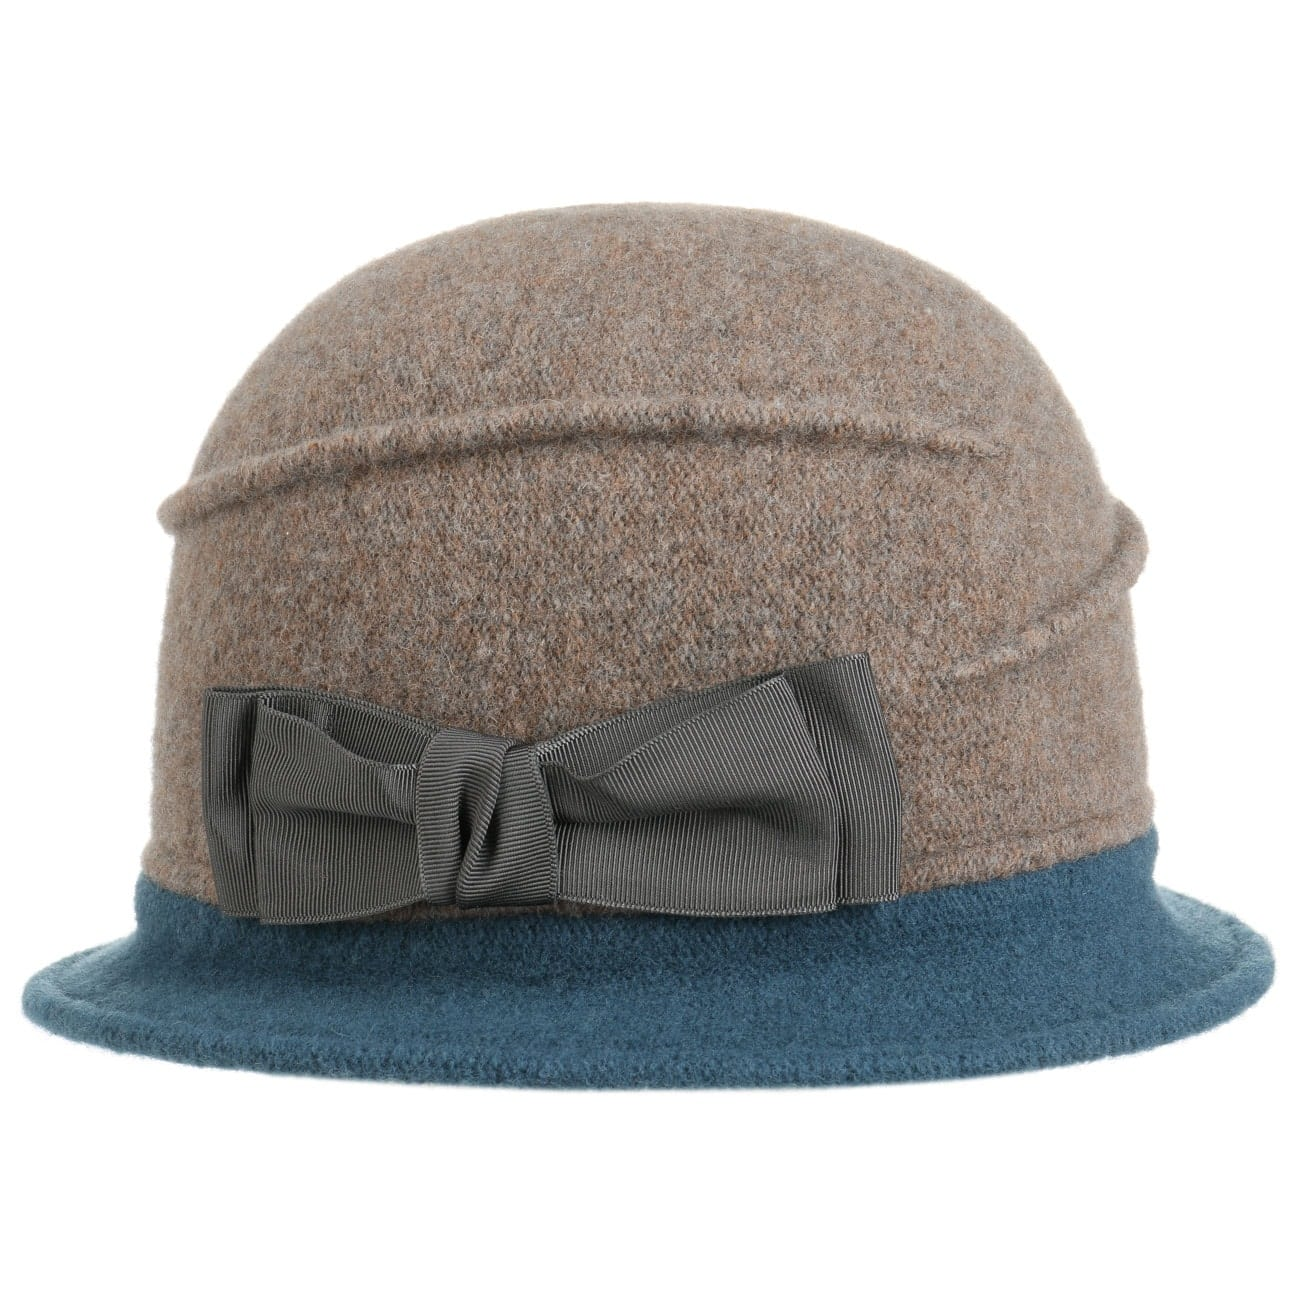 Gorro de Lana Hervida Oretka by bedacht  sombrero de lana